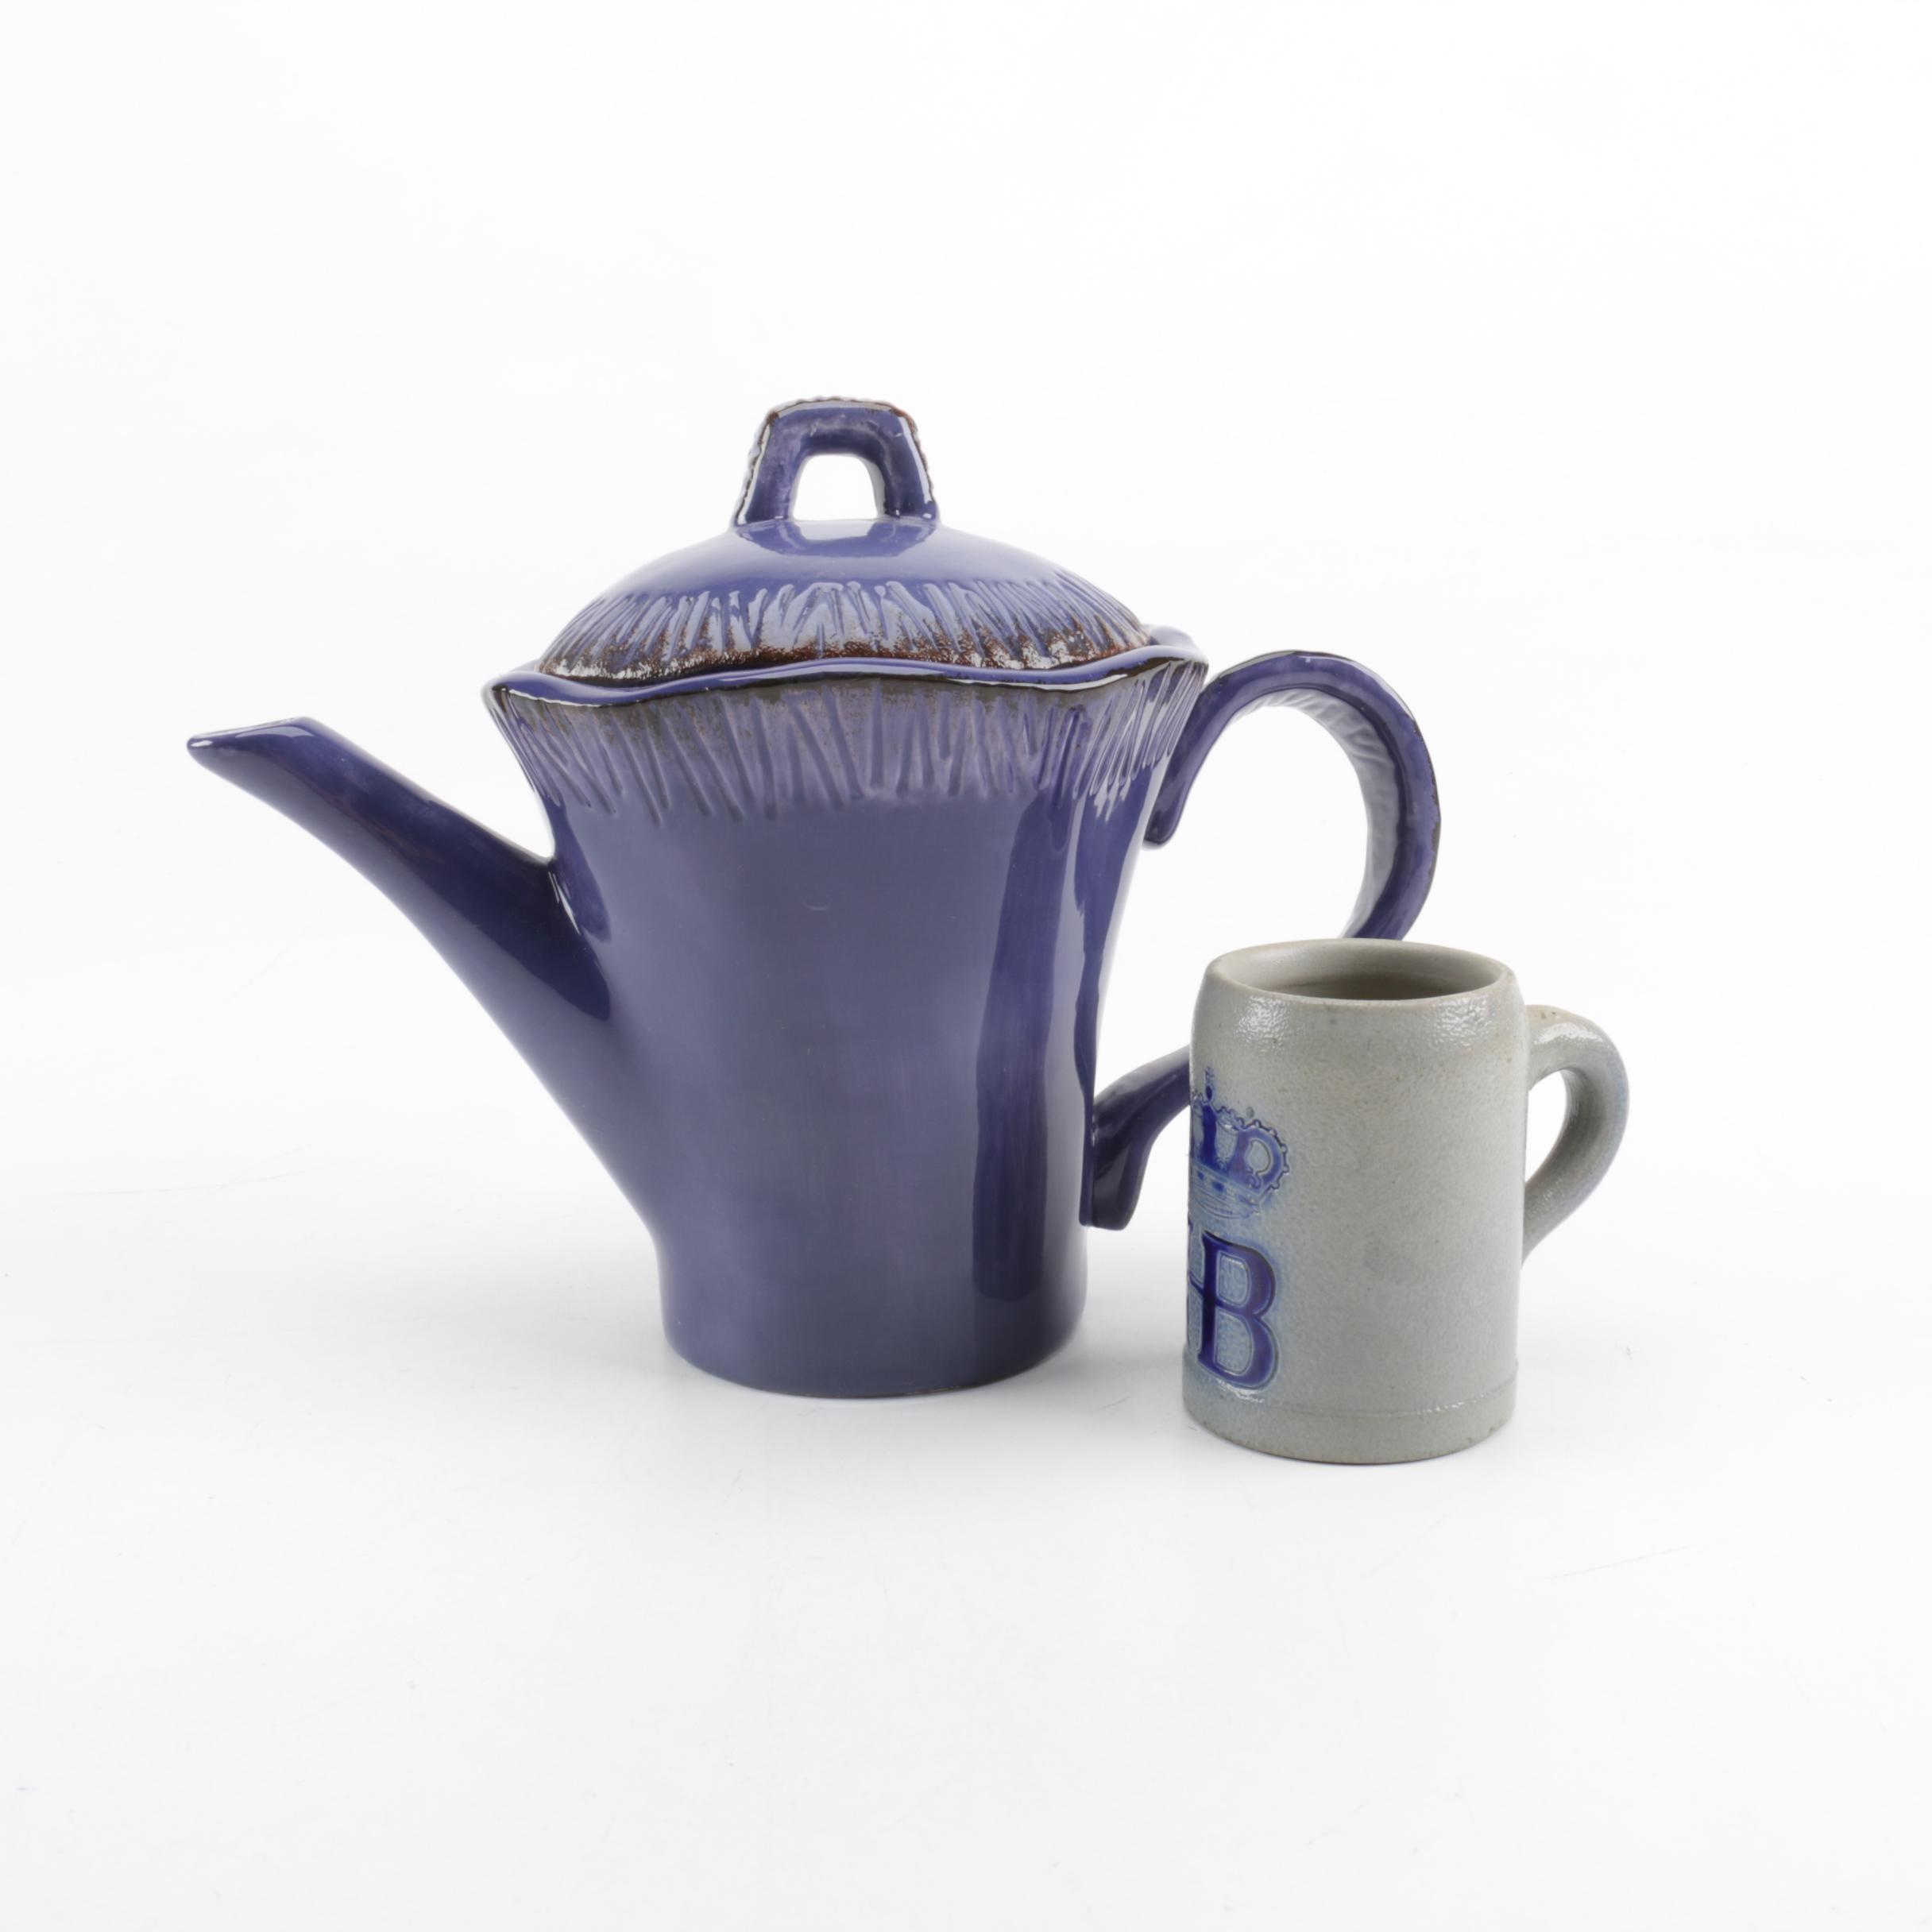 Bella Casa by Ganz Pitcher and a Hofbrauhaus Ceramic Mug